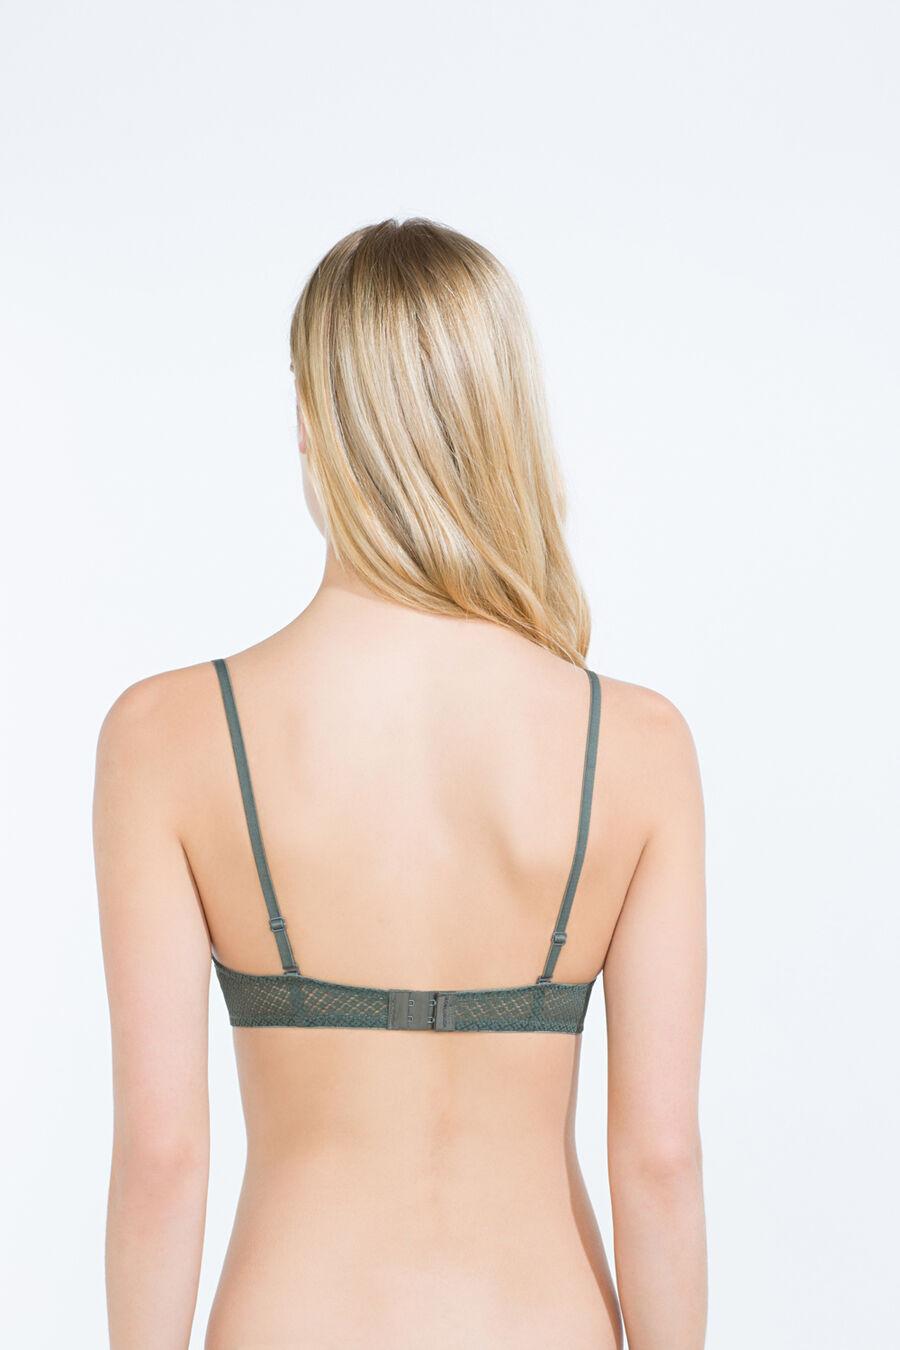 Miniflower classic padded bra